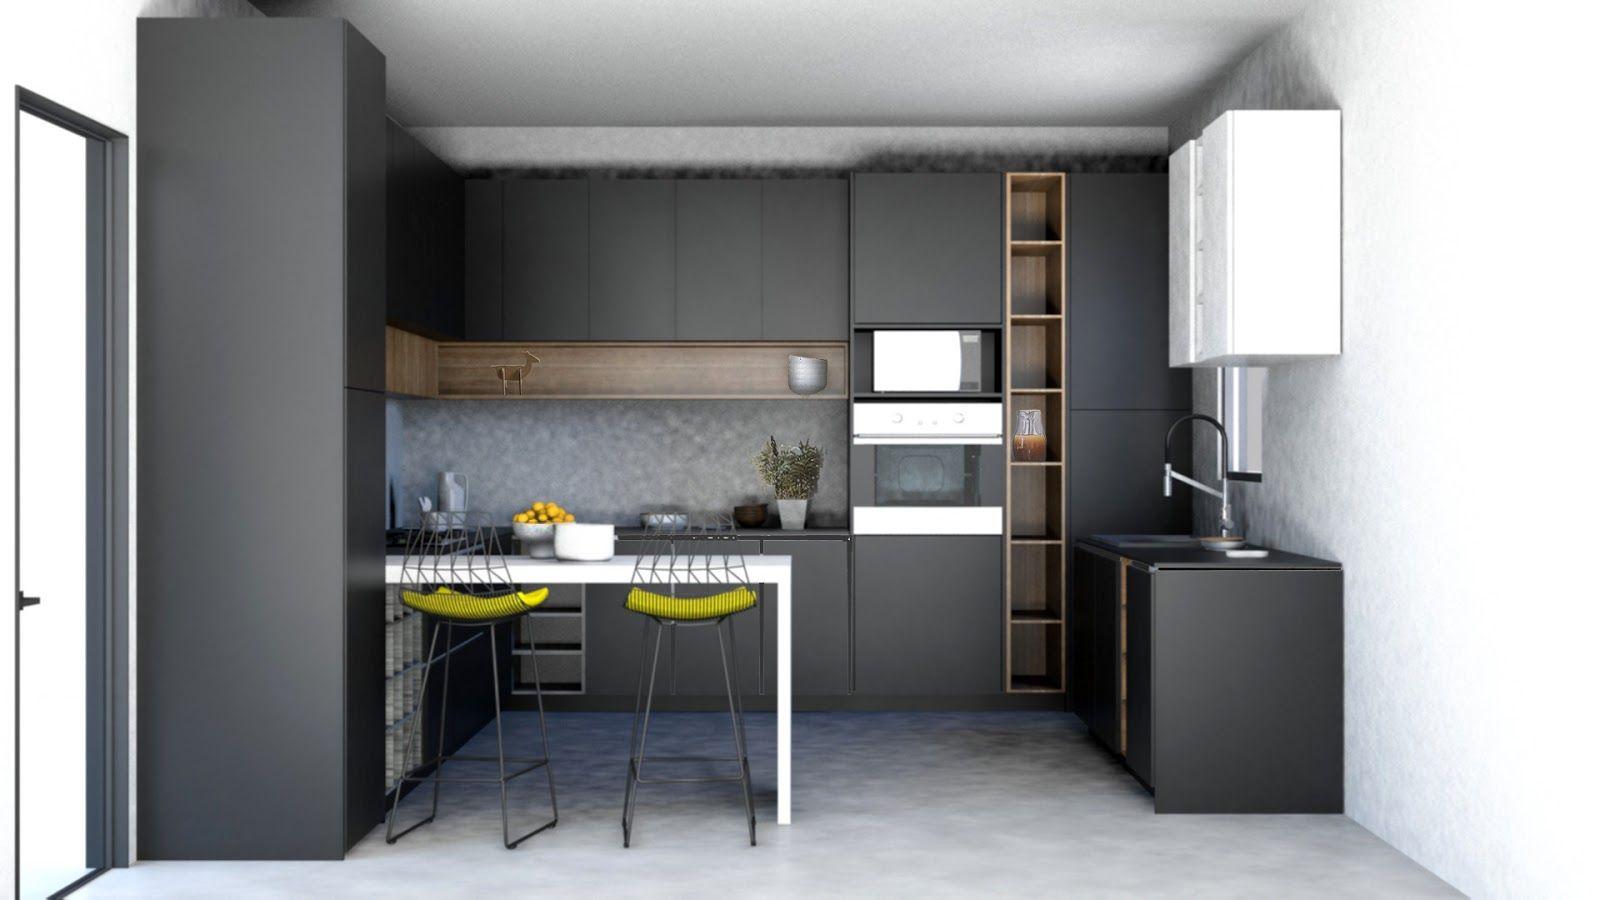 Allwood kitchen design New BLACK KITCHEN DESIGN for